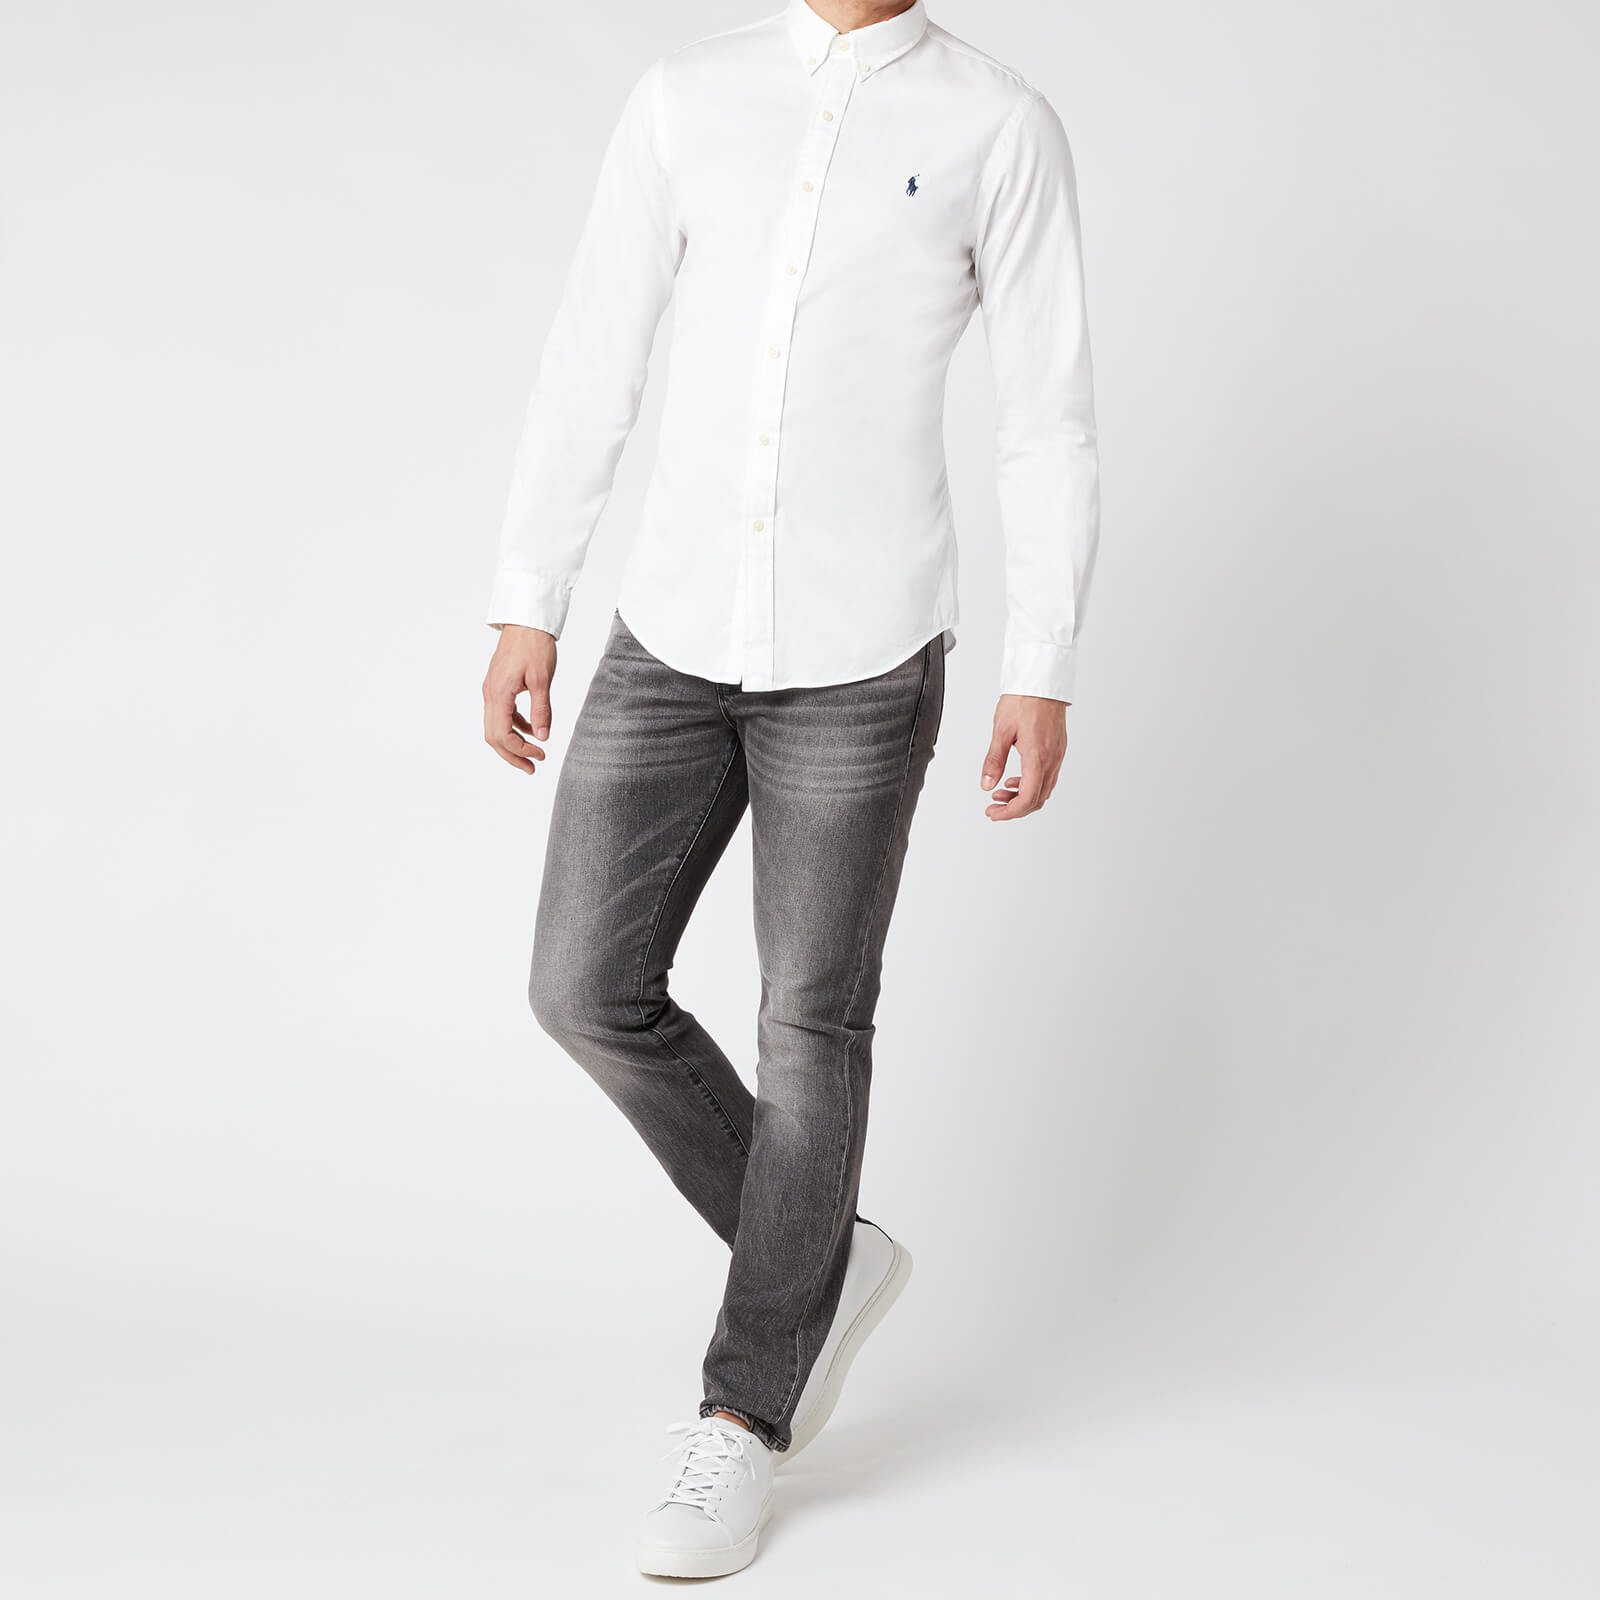 polo ralph lauren men's slim fit chino shirt - white - xl